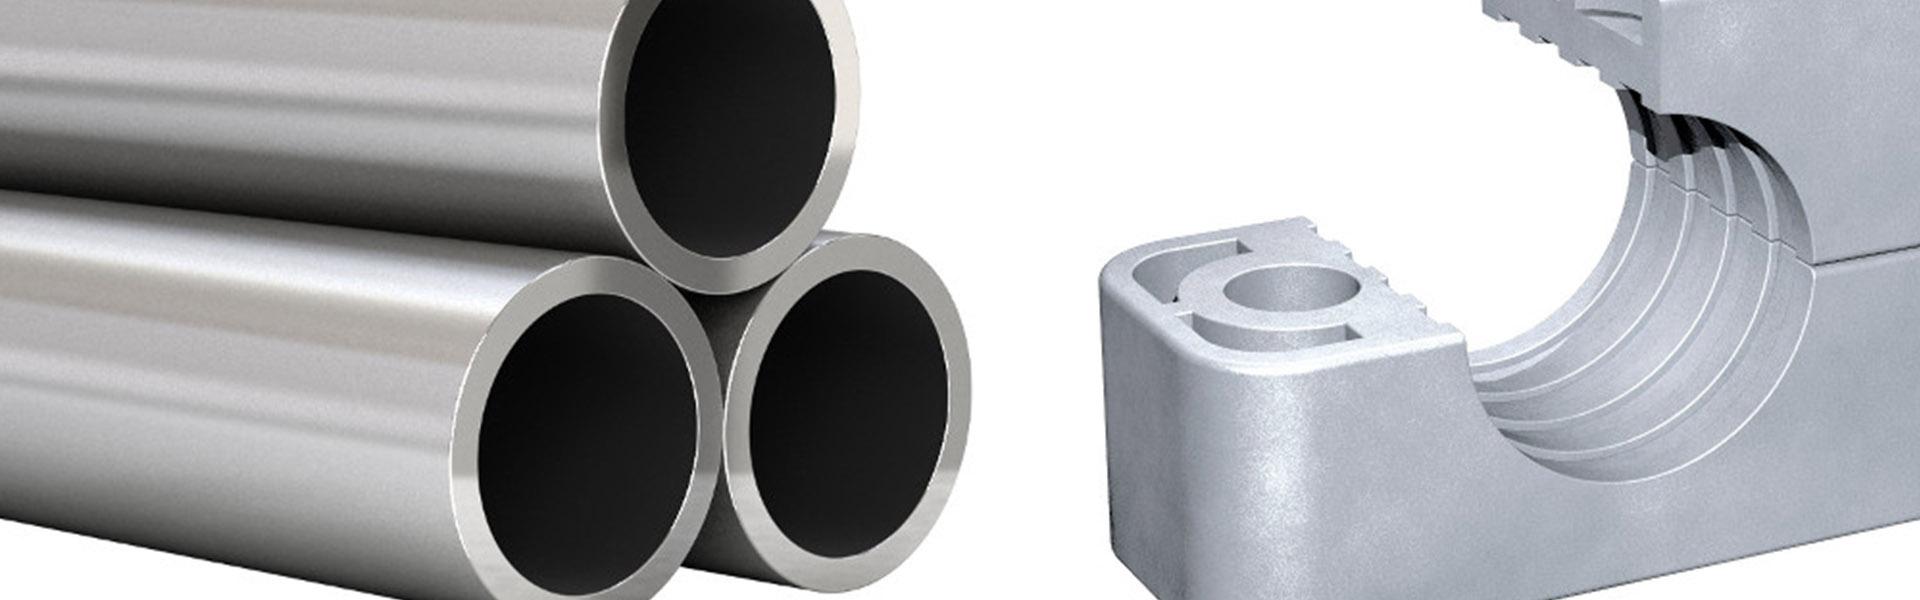 Hexafluid componenti oleodinamici tubi e collari